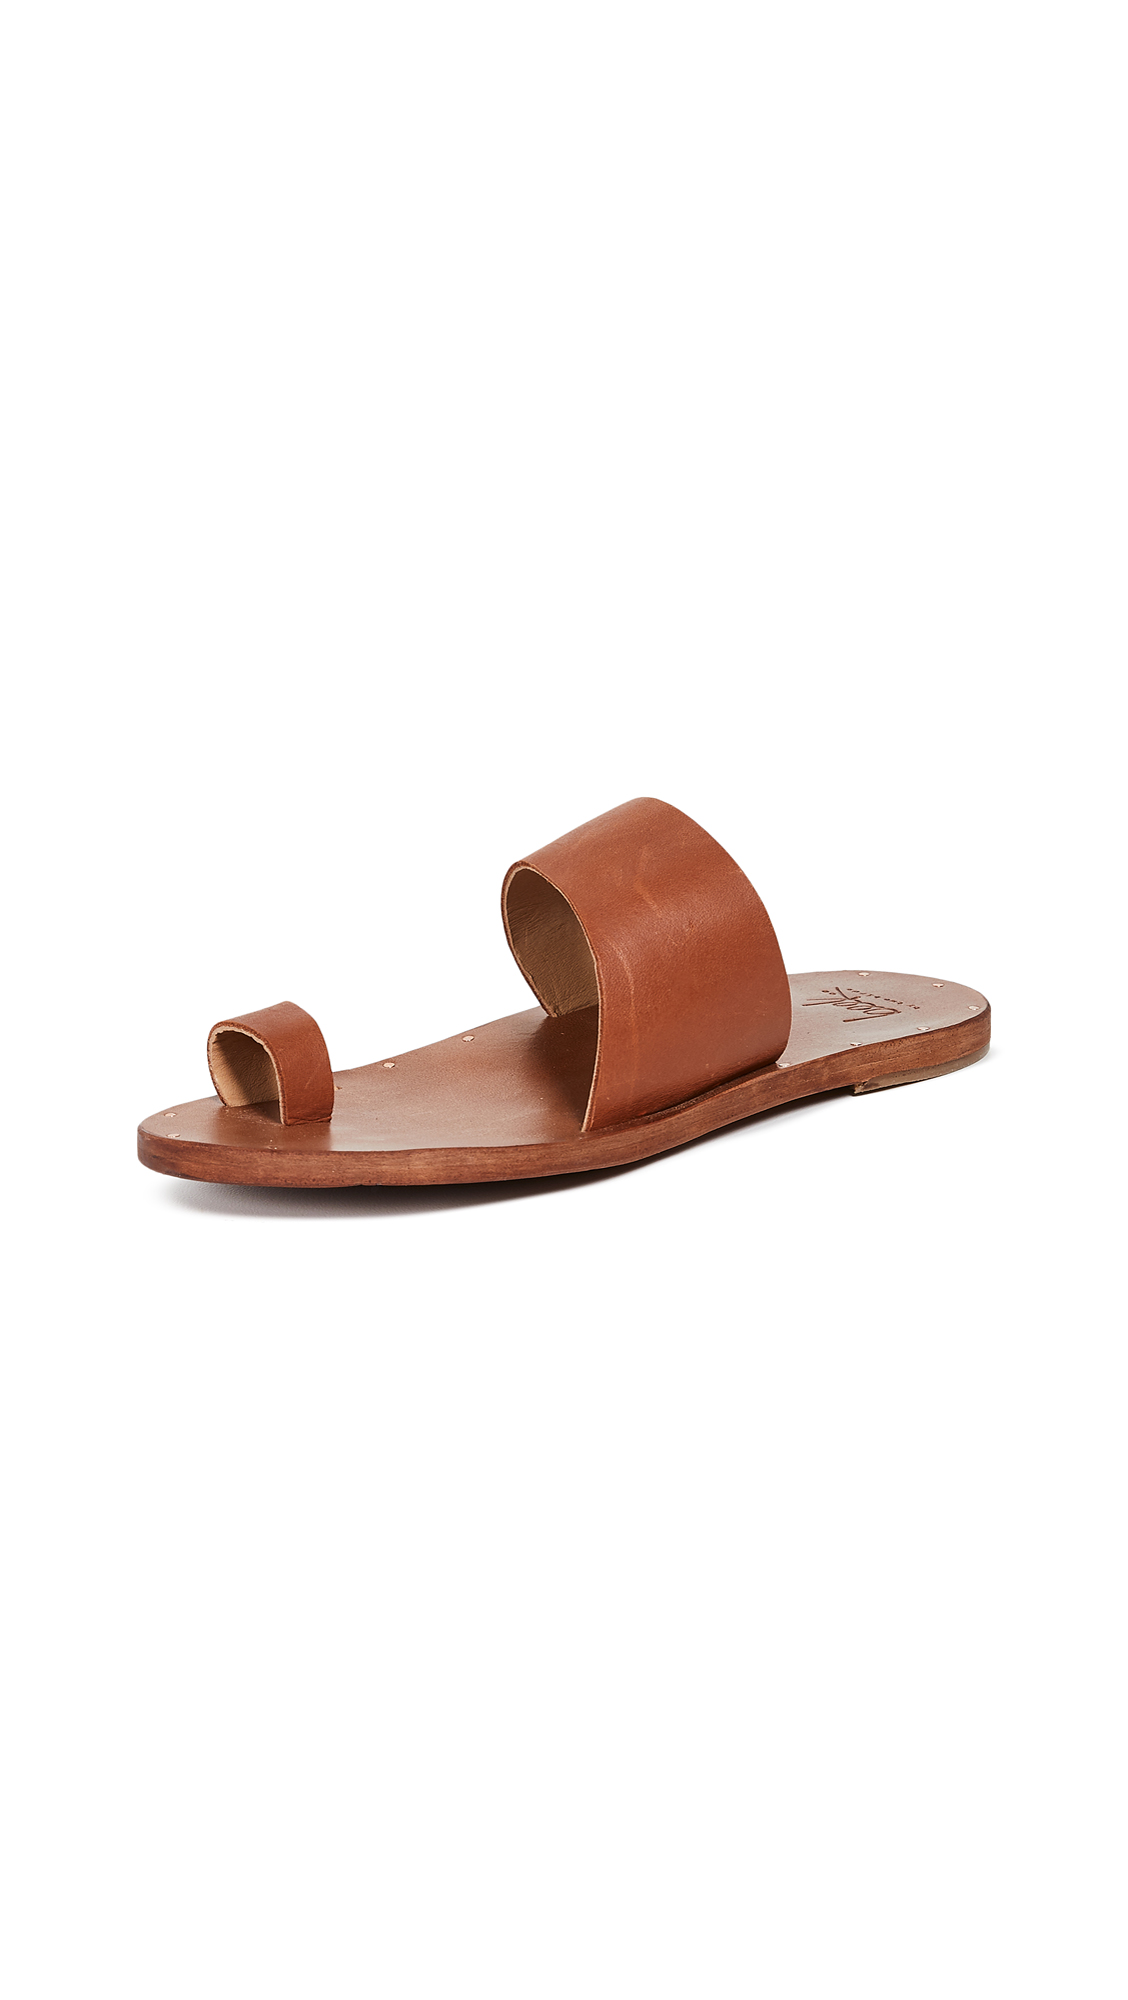 BEEK Finch Sandals in Tan/Tan